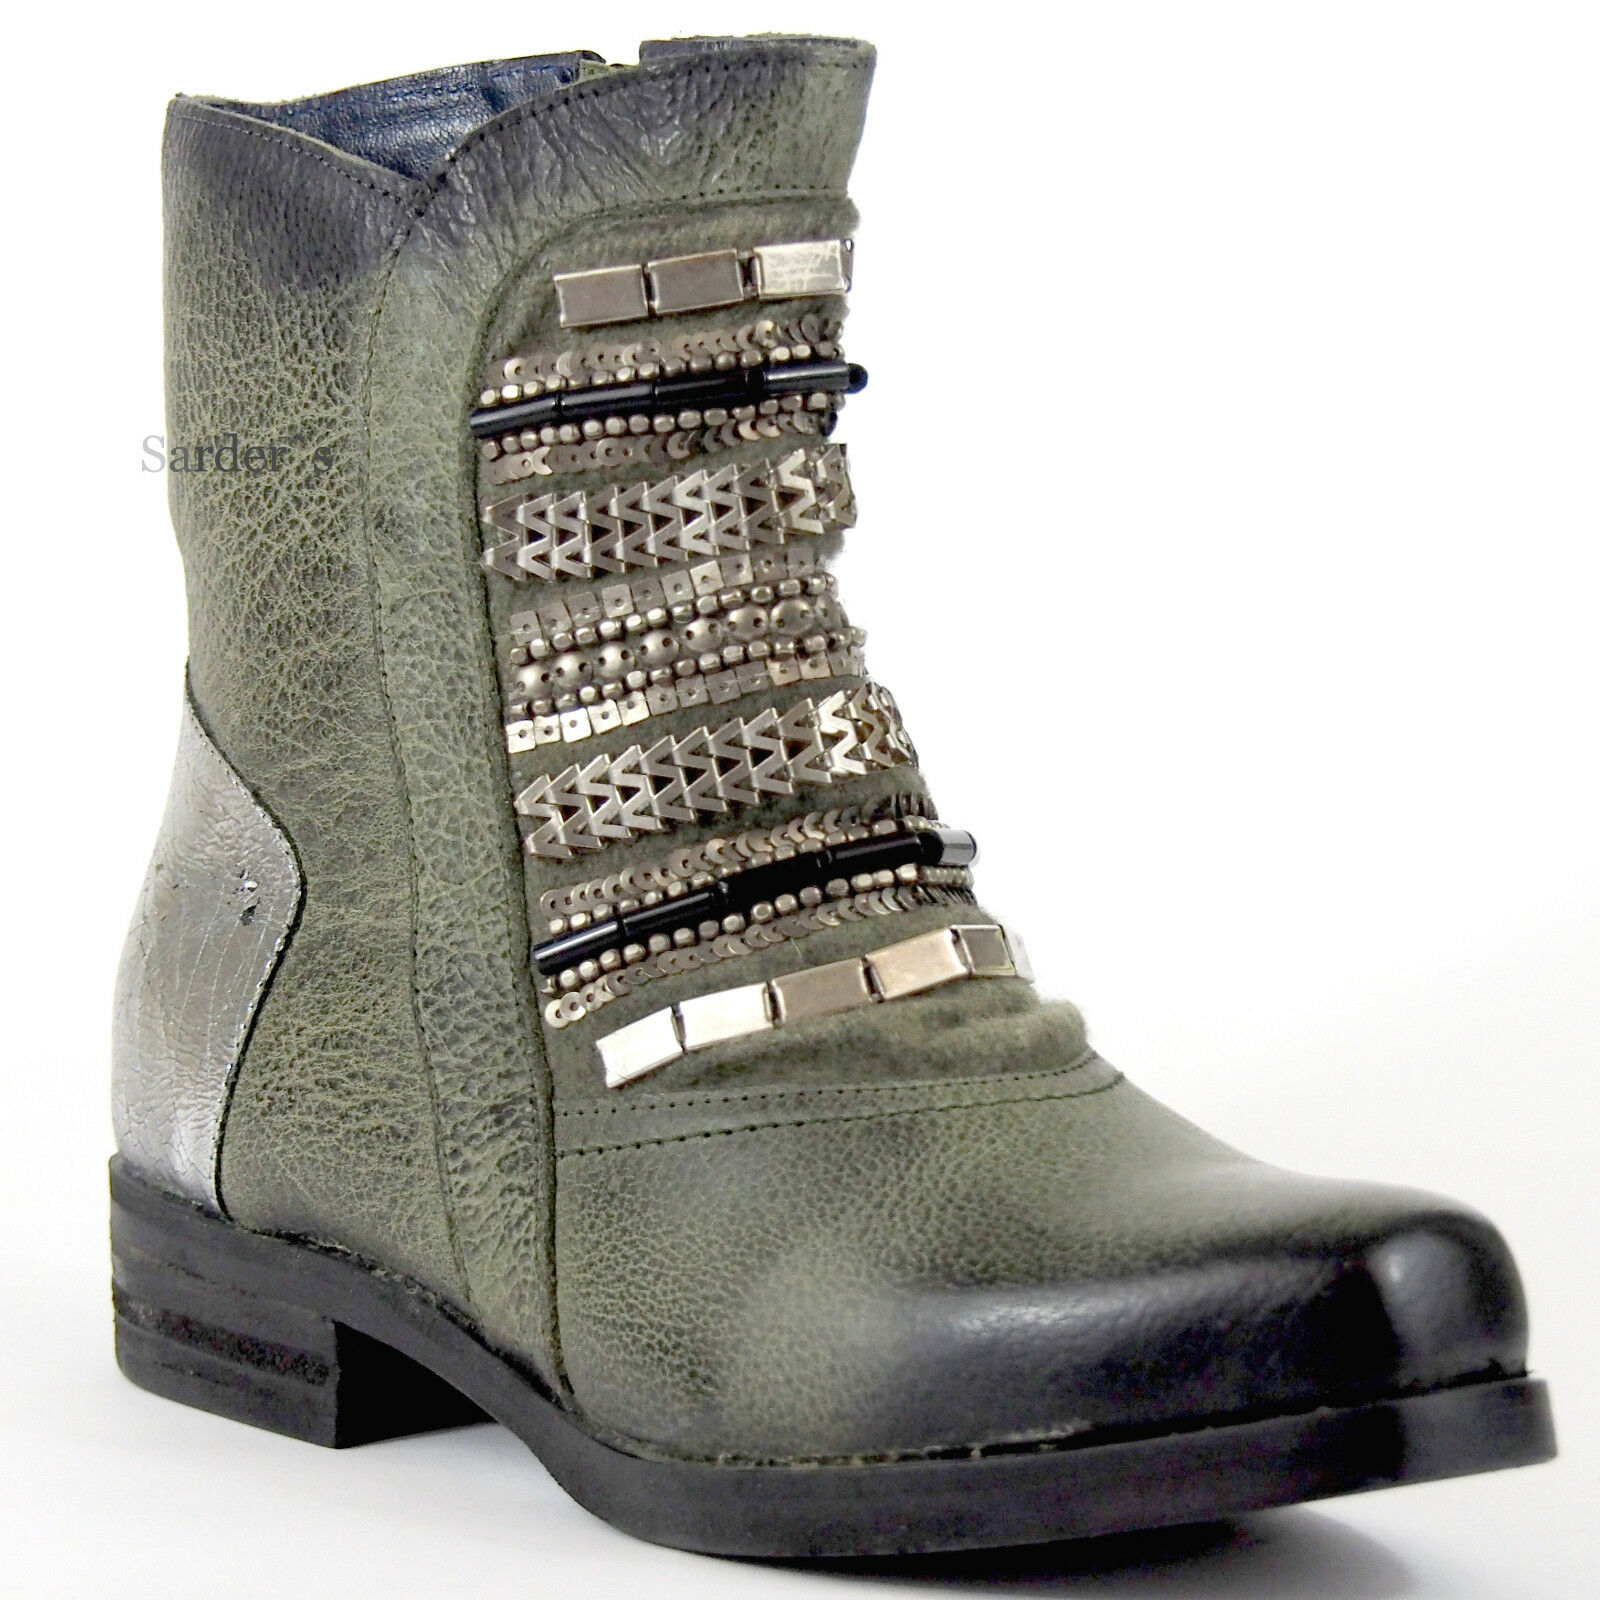 Zapatos especiales con descuento XYXYX Stiefelette 37 Nappa LEDER Oliv Silber Used Boots Schmuck Hand Made So NEU